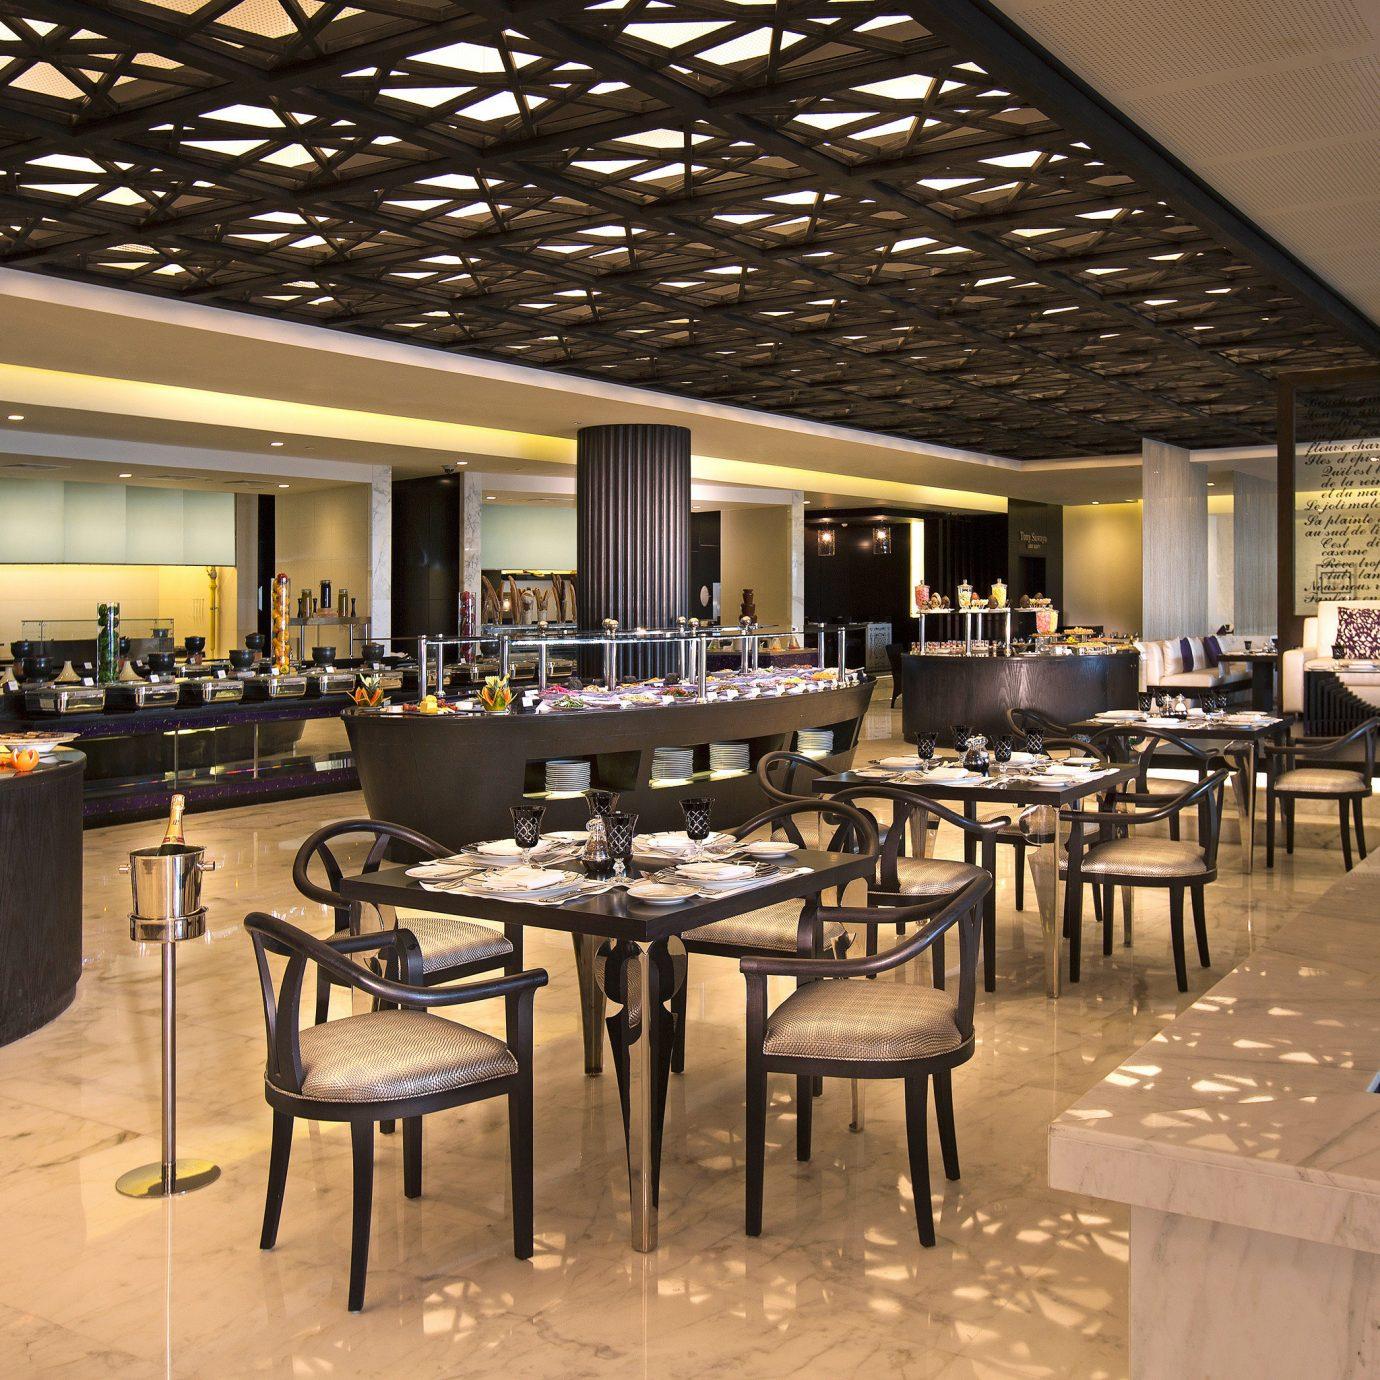 Business City Dining Modern Spa chair restaurant function hall café convention center Resort cafeteria Lobby Bar ballroom set Island